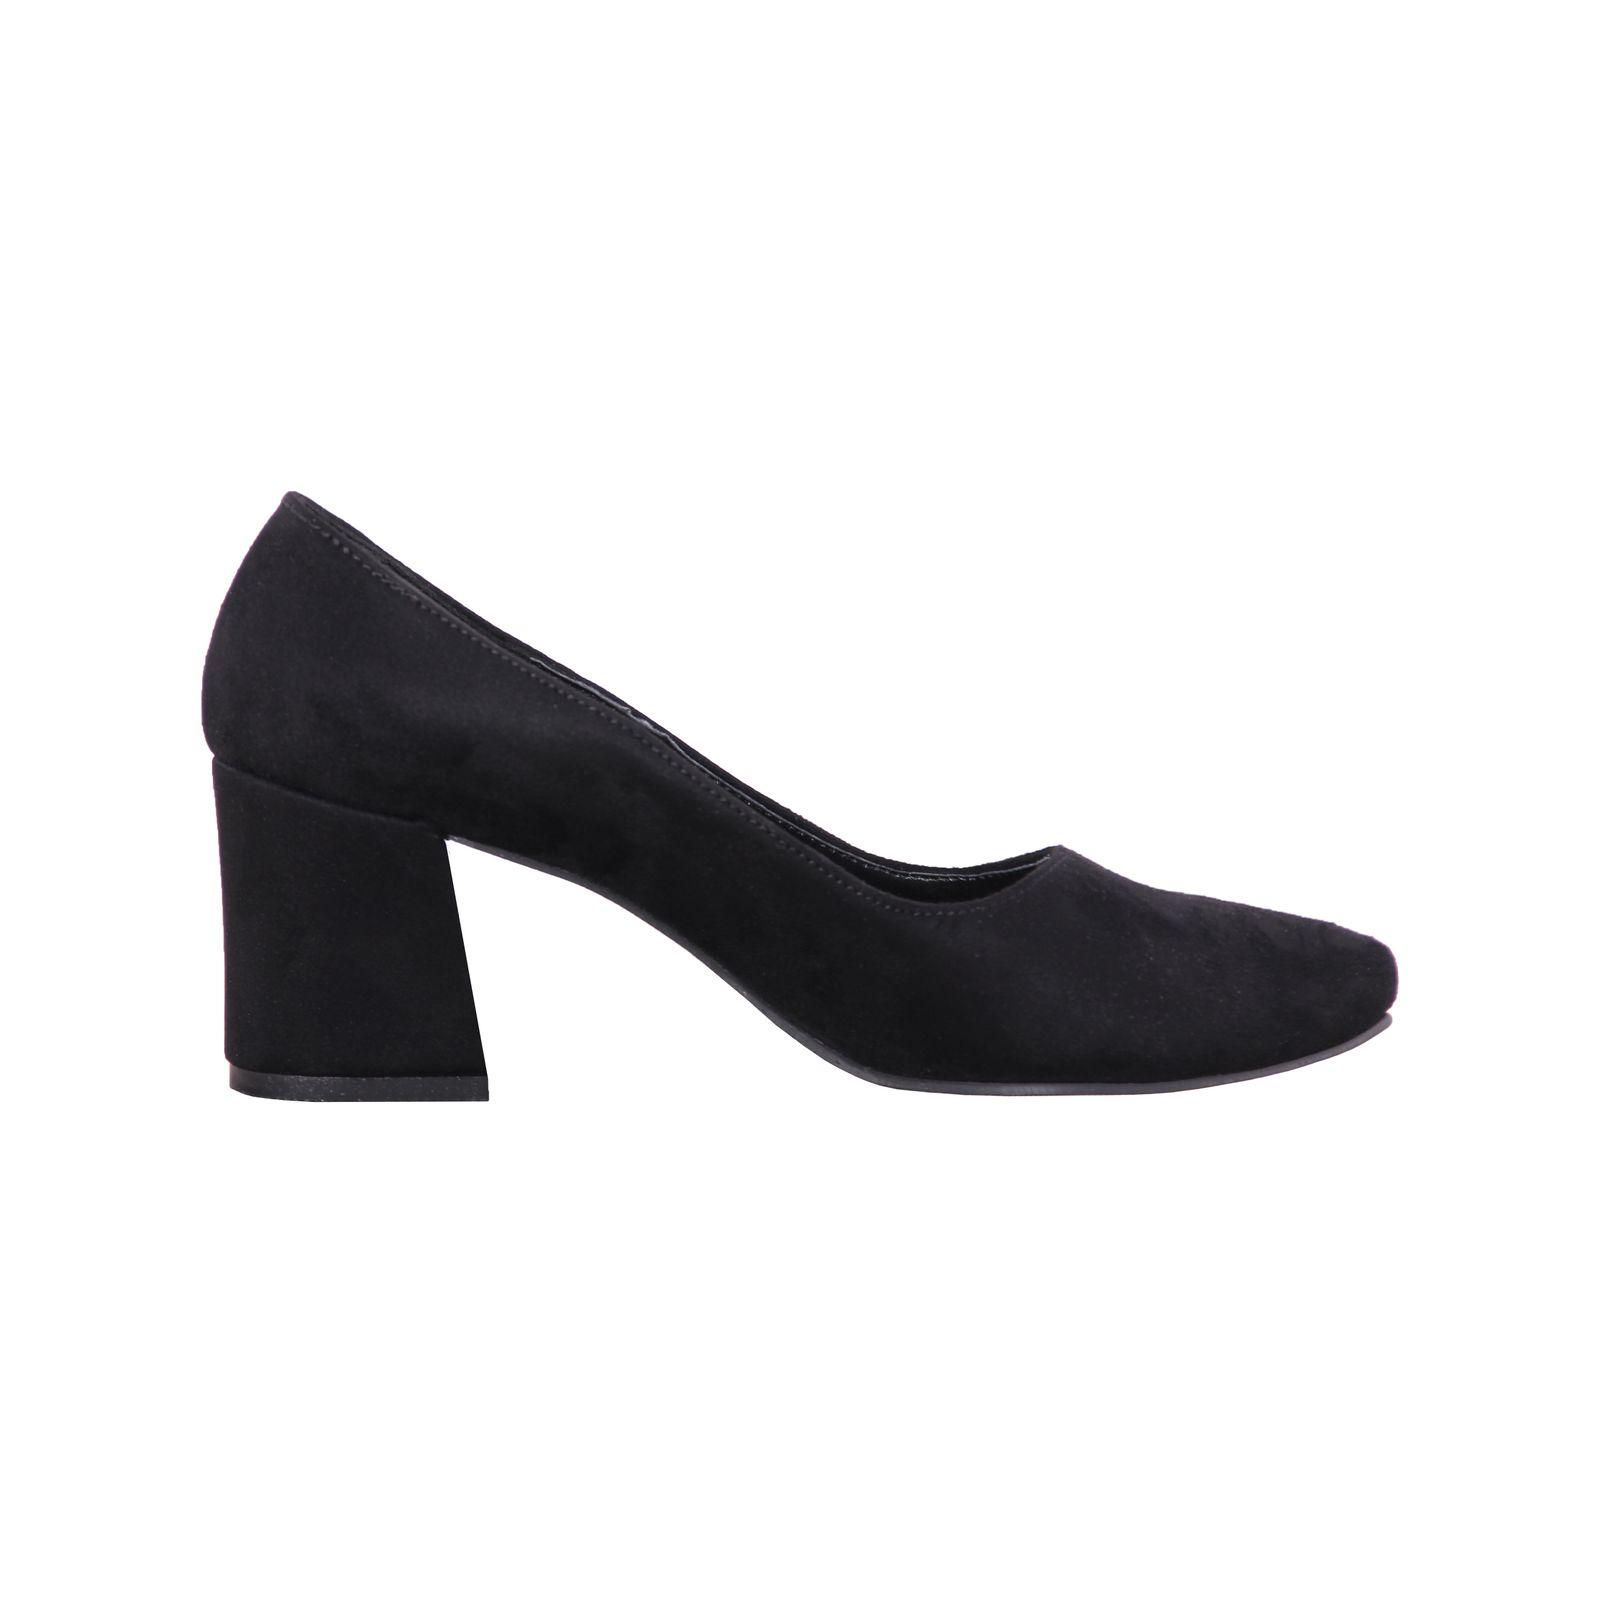 کفش زنانه کد 1-39953  main 1 2